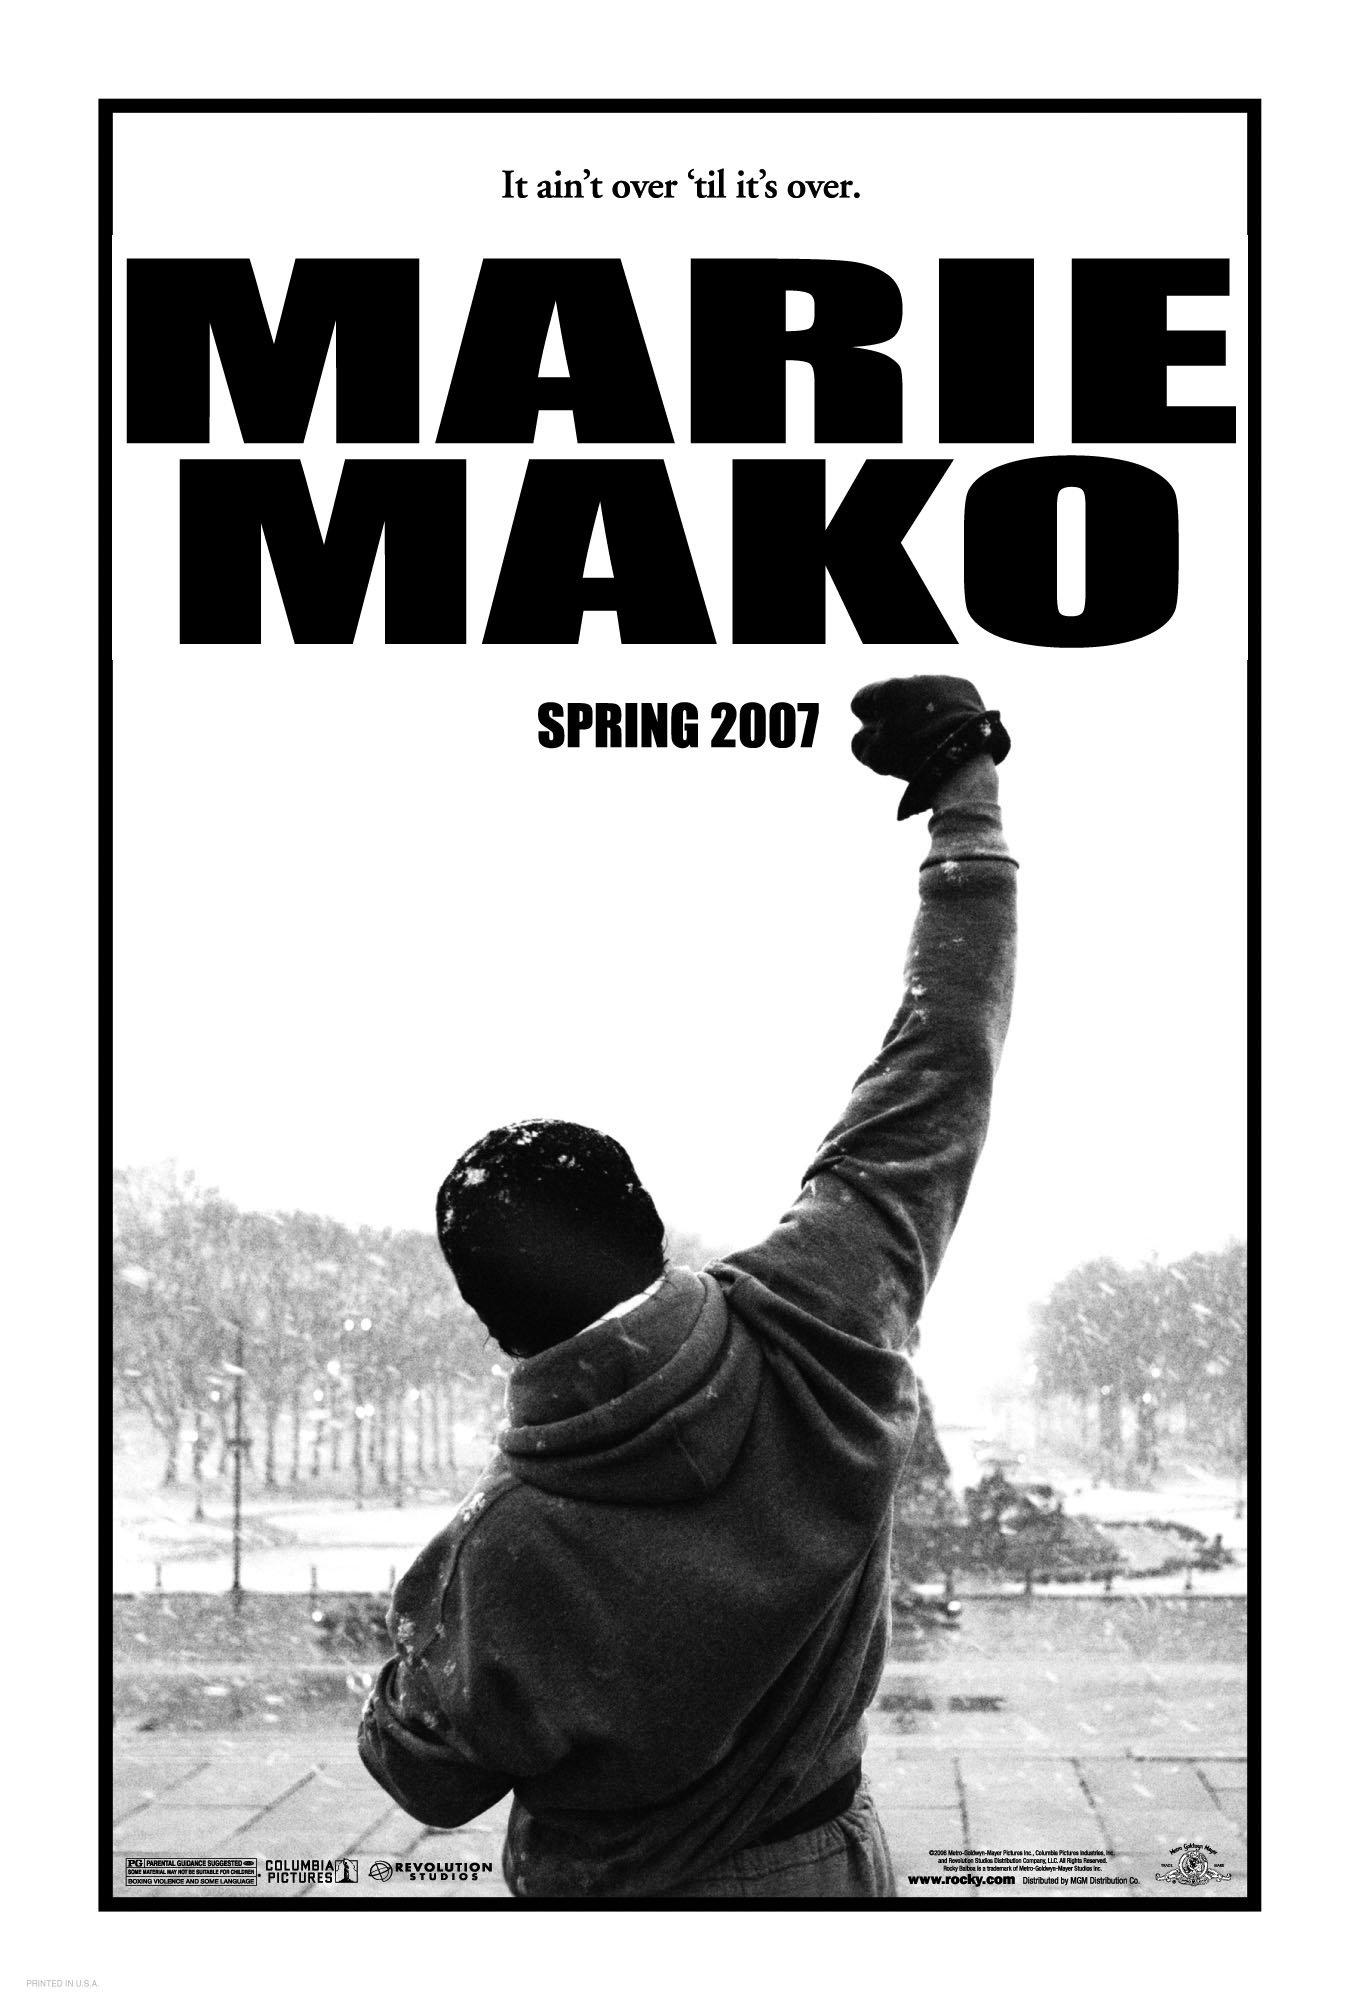 Mako Balboa